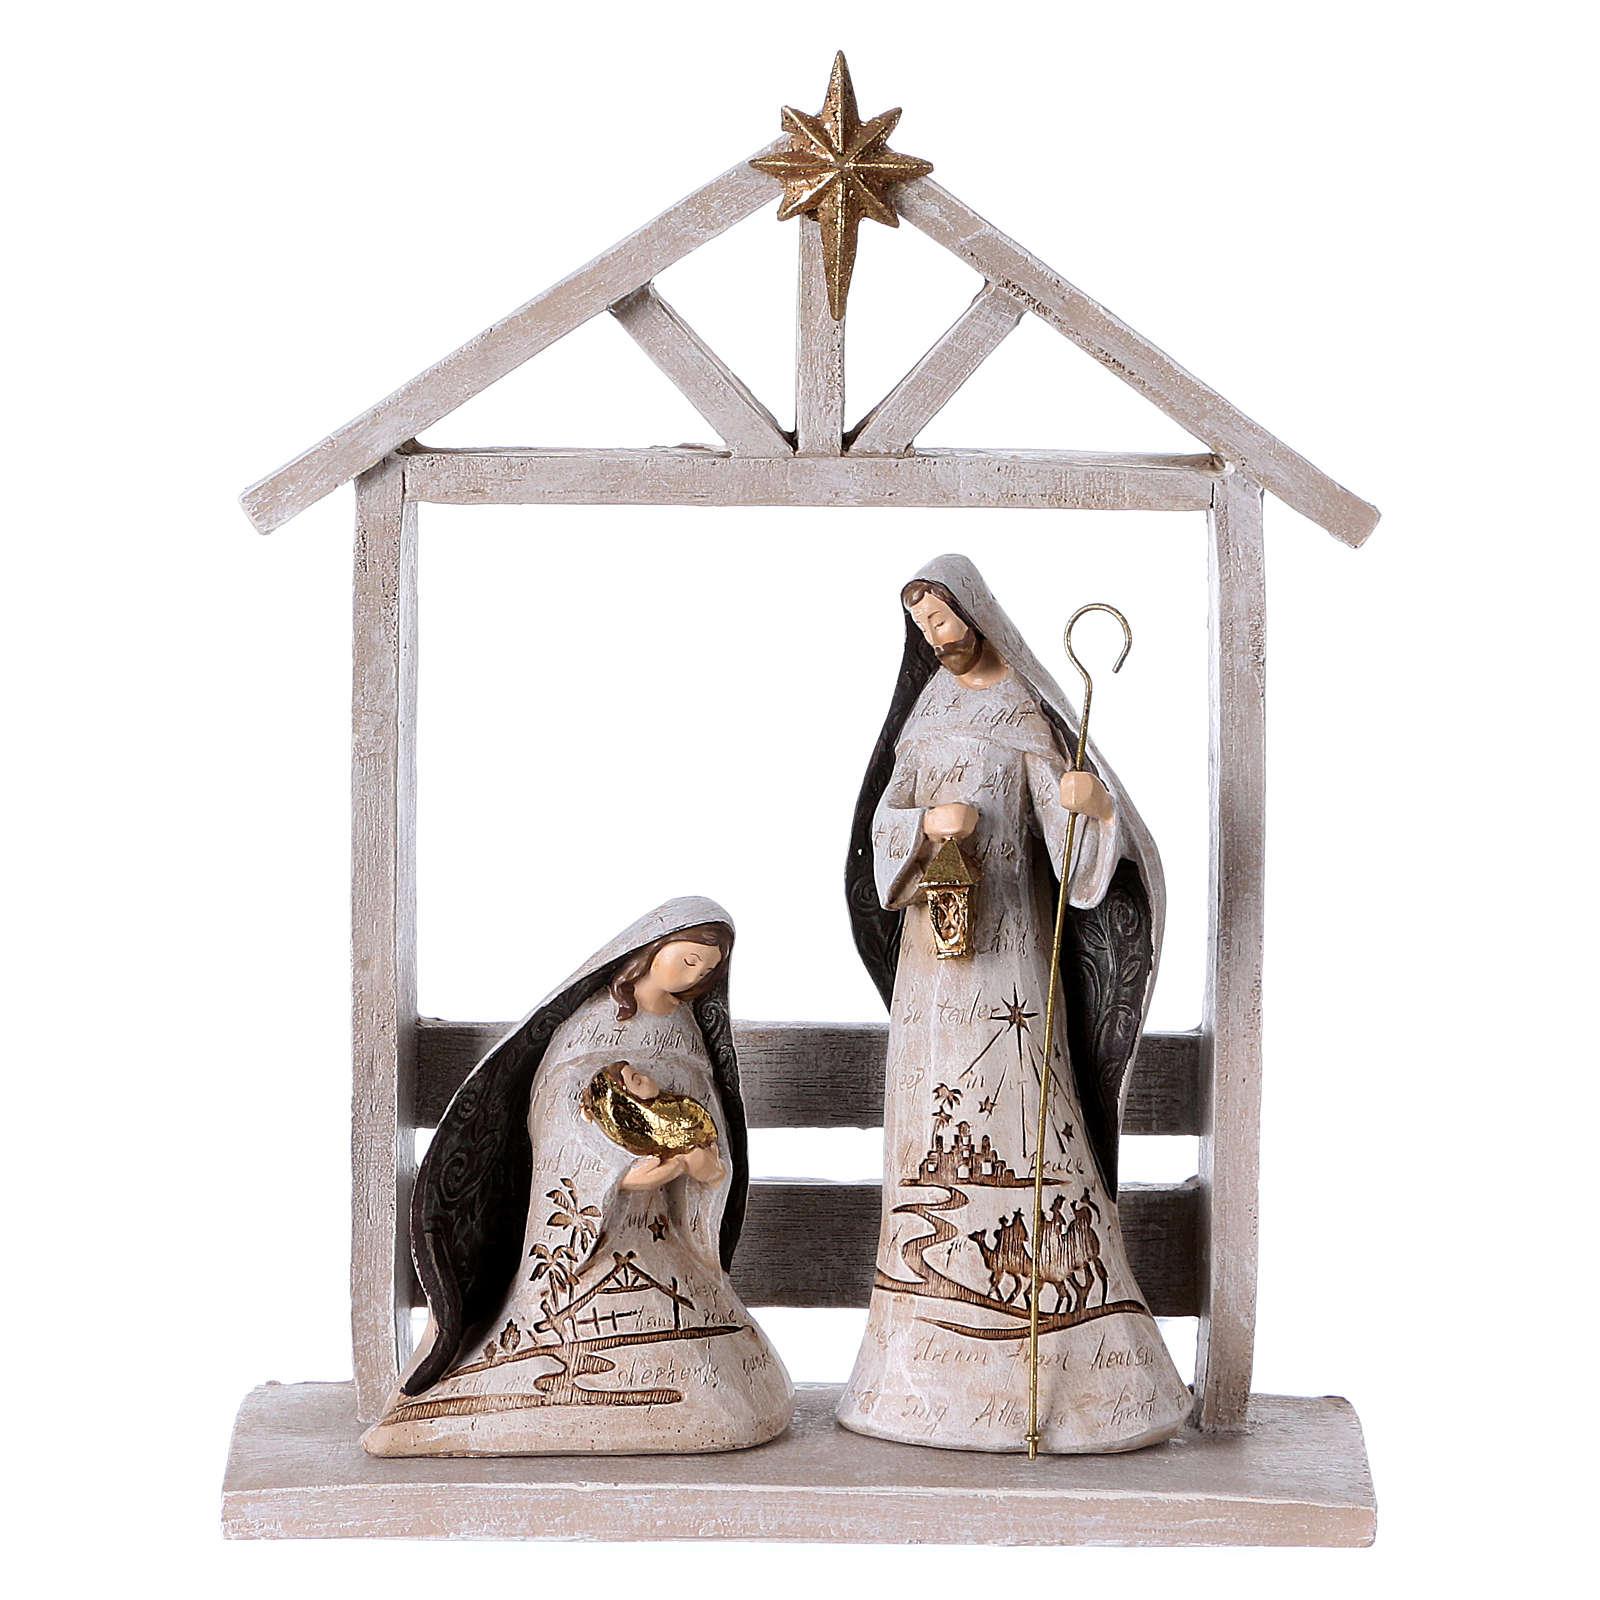 White Nativity Scene 30 cm, set of 6 figurines 4